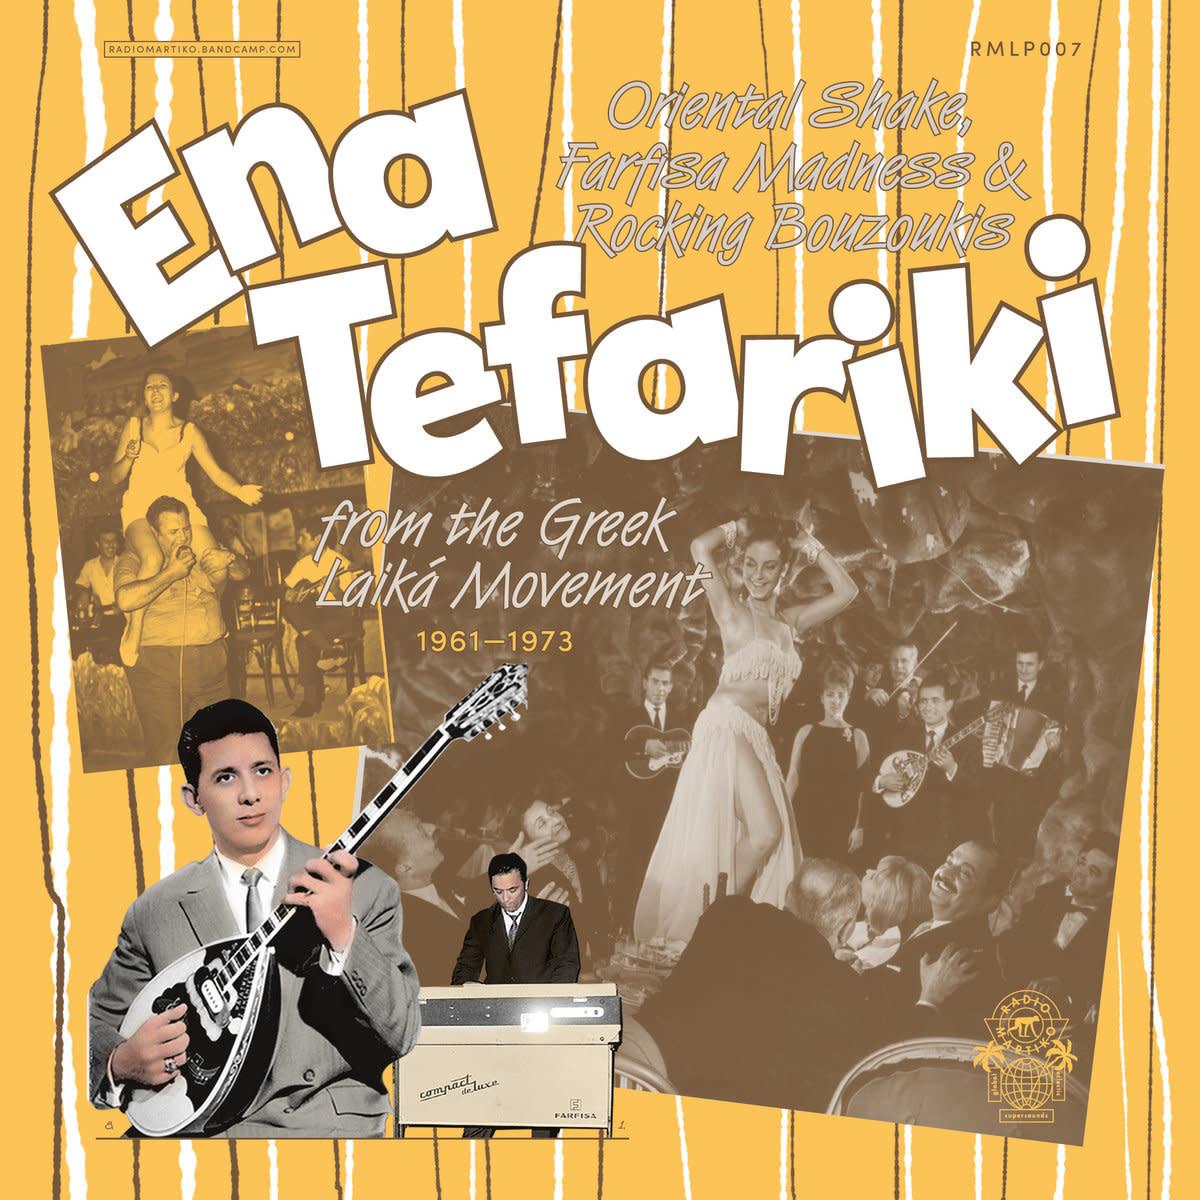 Radio Martiko Various - Ena Tefariki: Oriental Shake, Farfisa Madness & Rocking Bouzoukis From The Greek Laika Movement (1961-1973)